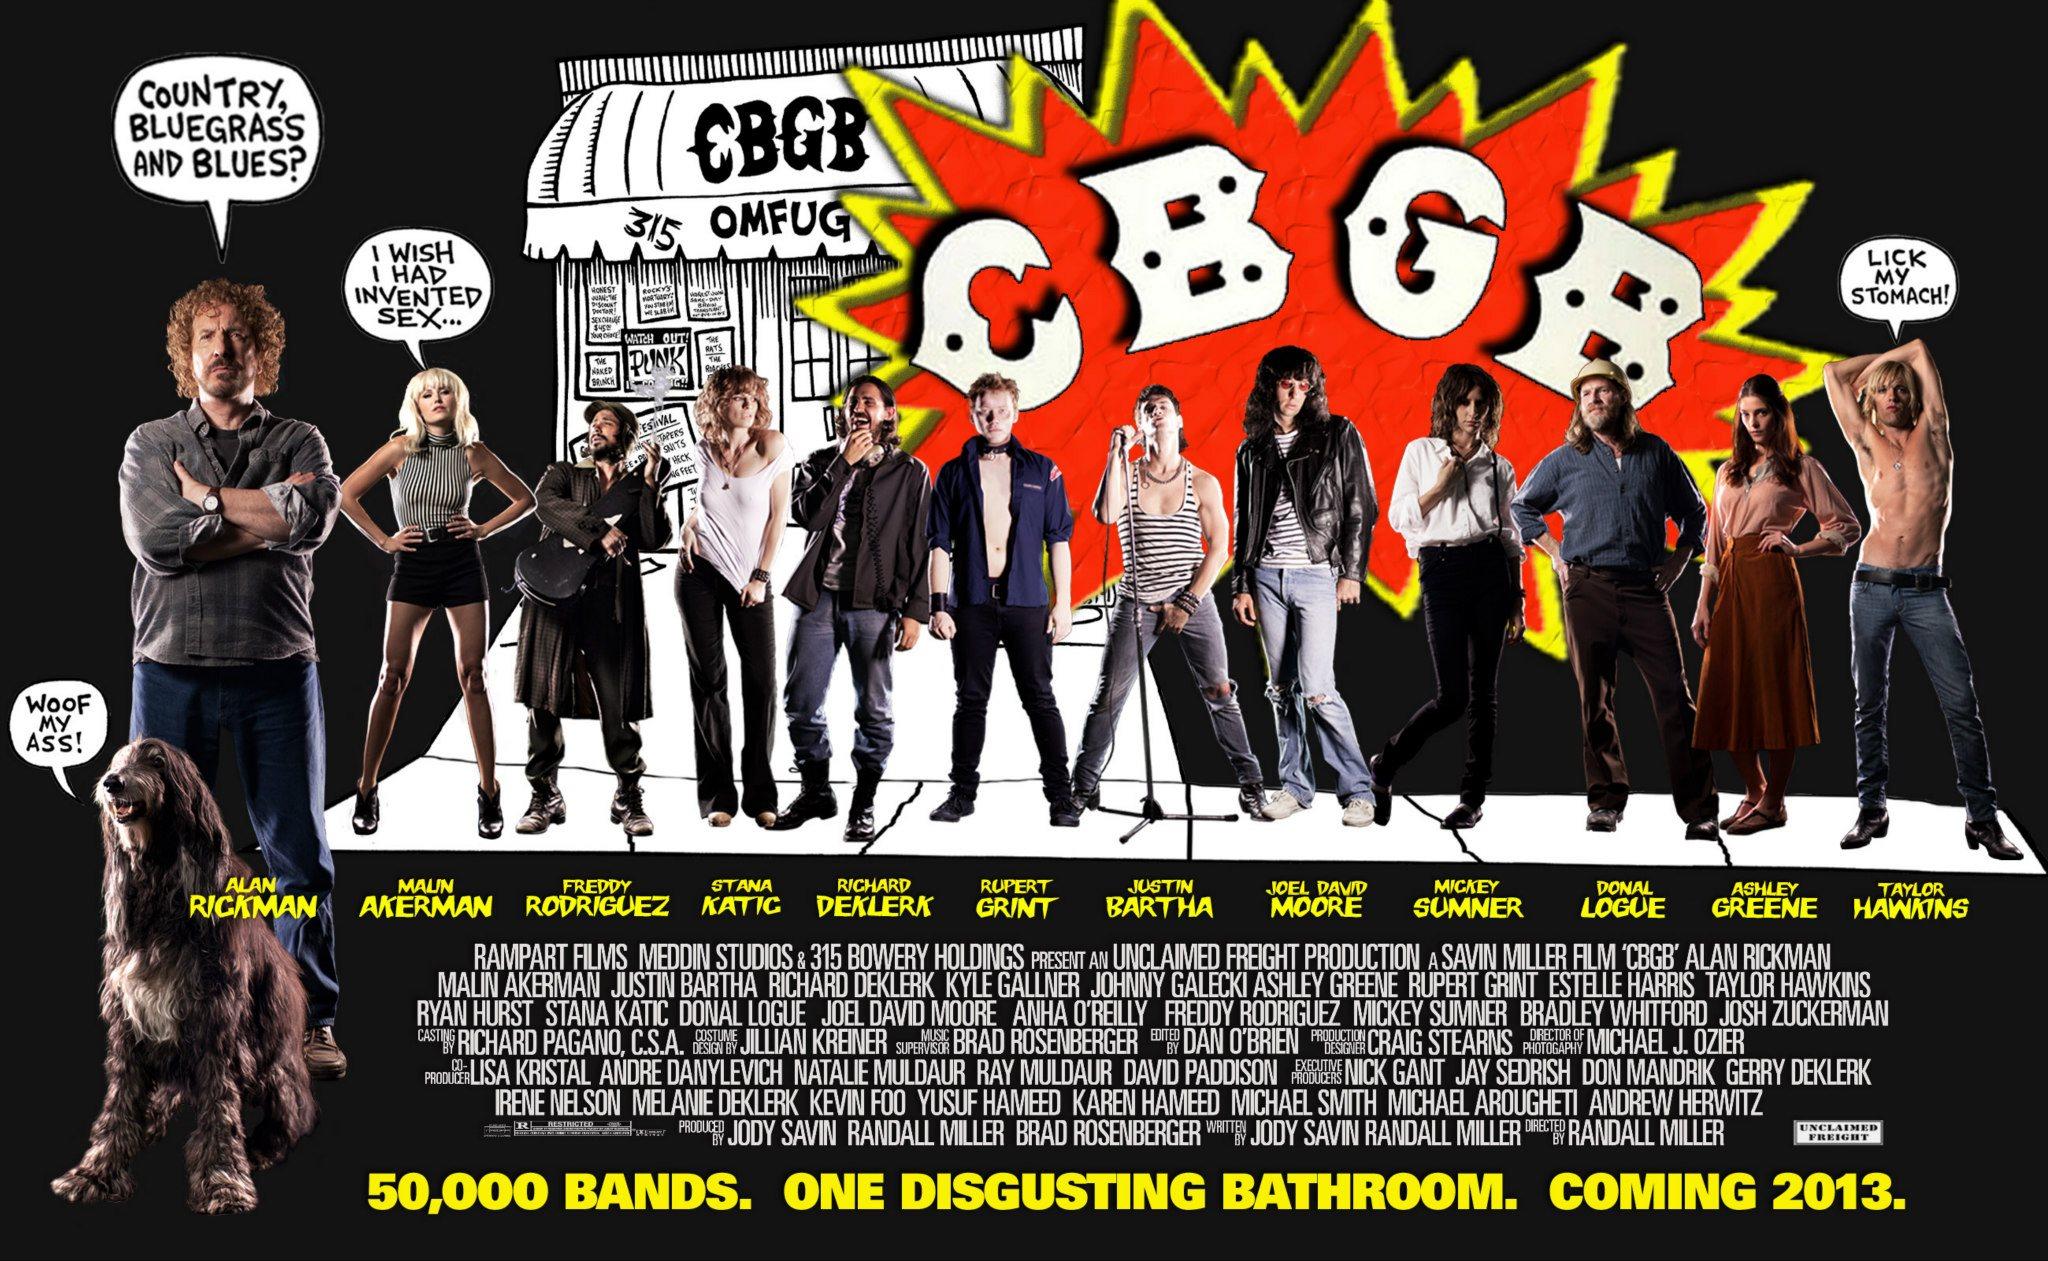 cbgb-movieposter.jpg